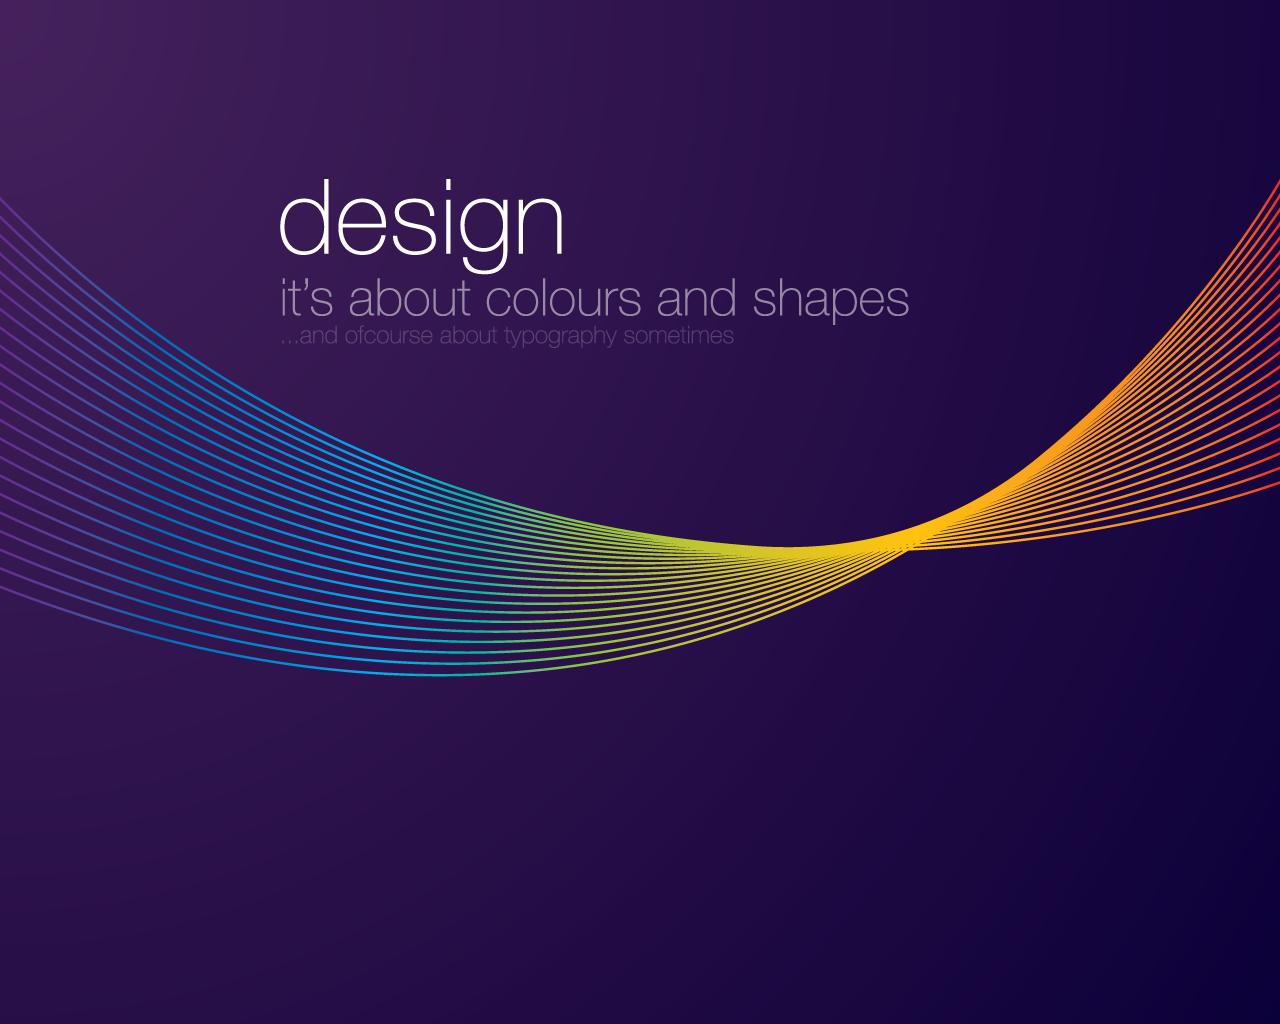 Color Designer Enchanting With Graphic Design Shapes Color Image